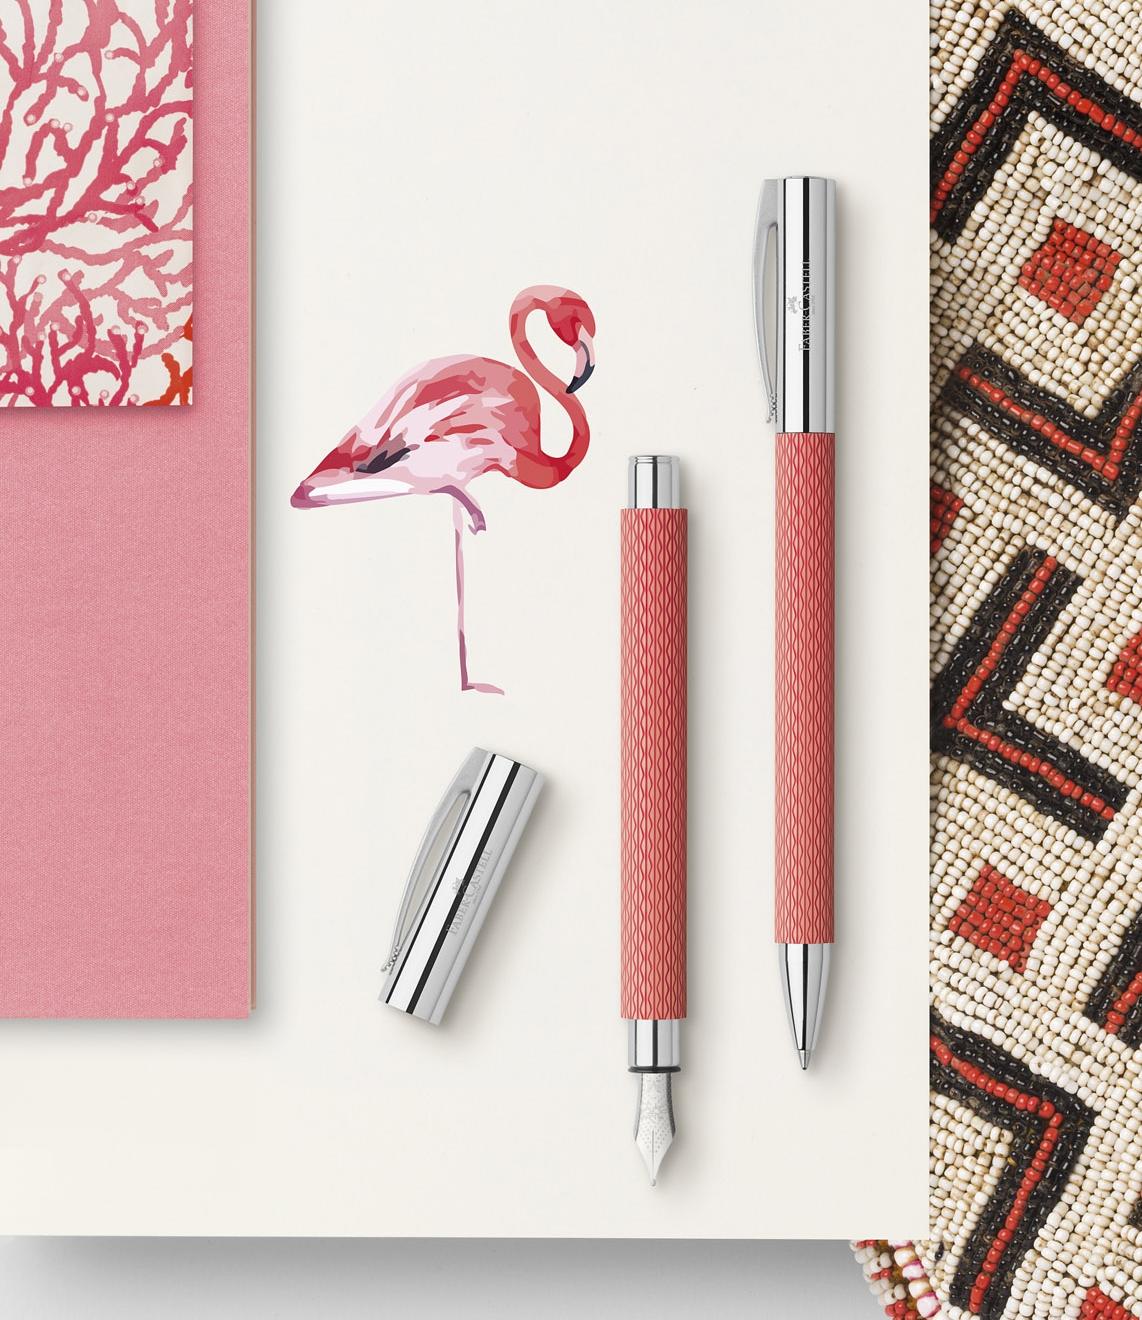 F-C_AMBITION OpArt Flamingo_Sujet.jpg